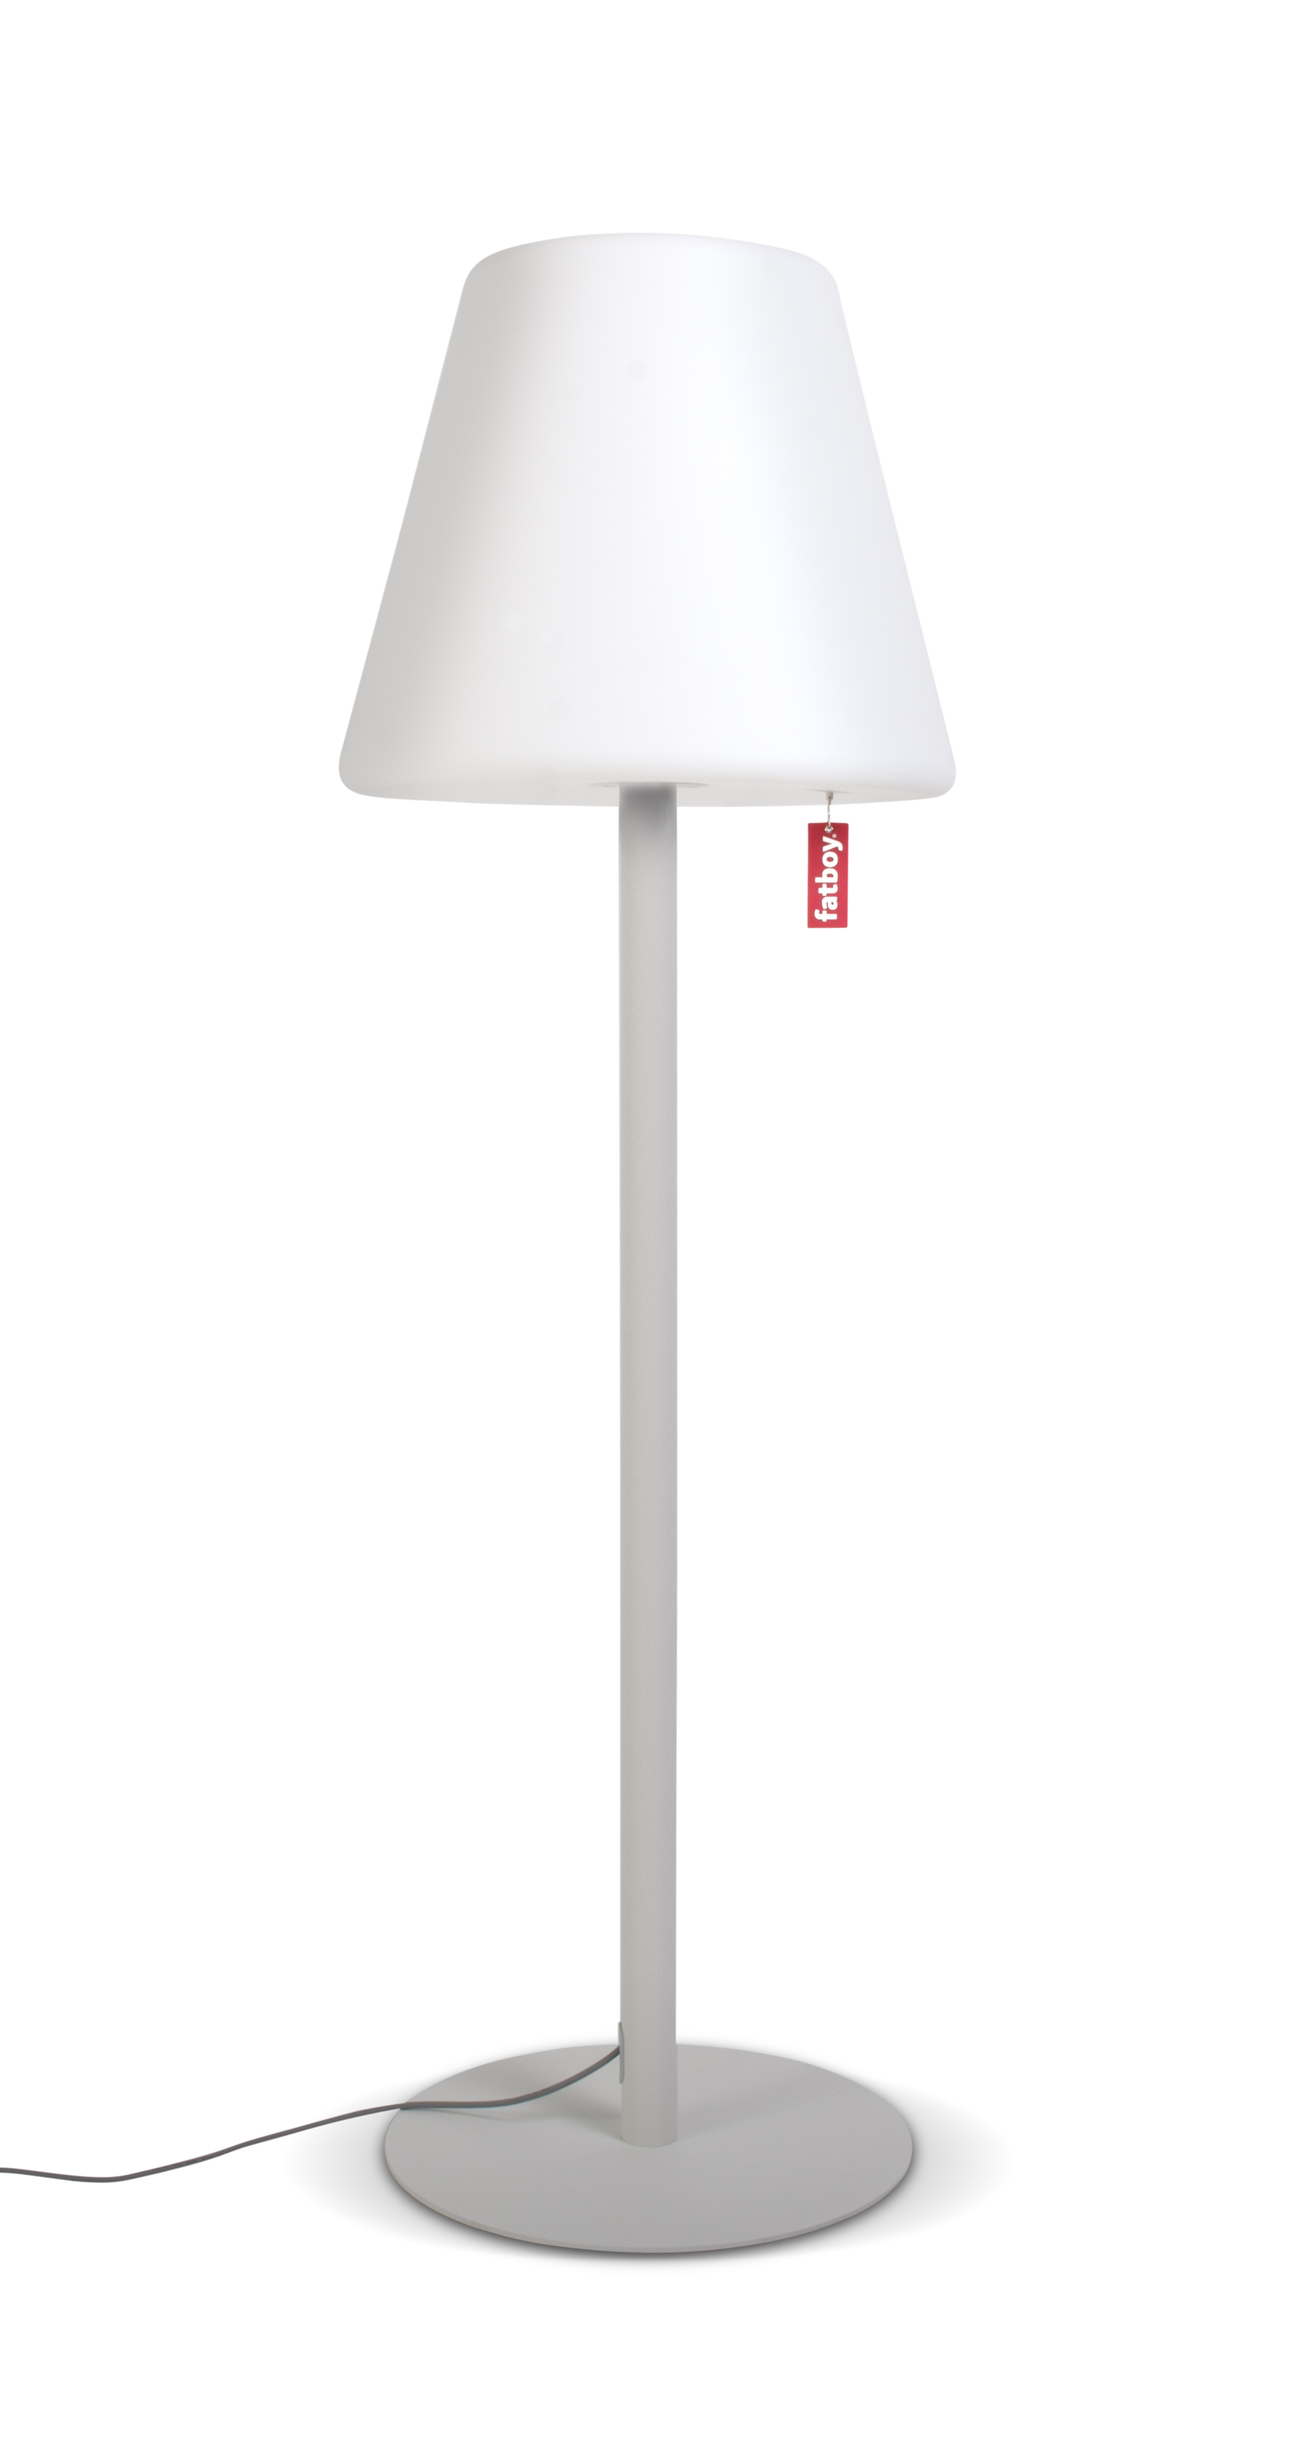 Fatboy Edison the Giant vloerlamp-Licht grijs